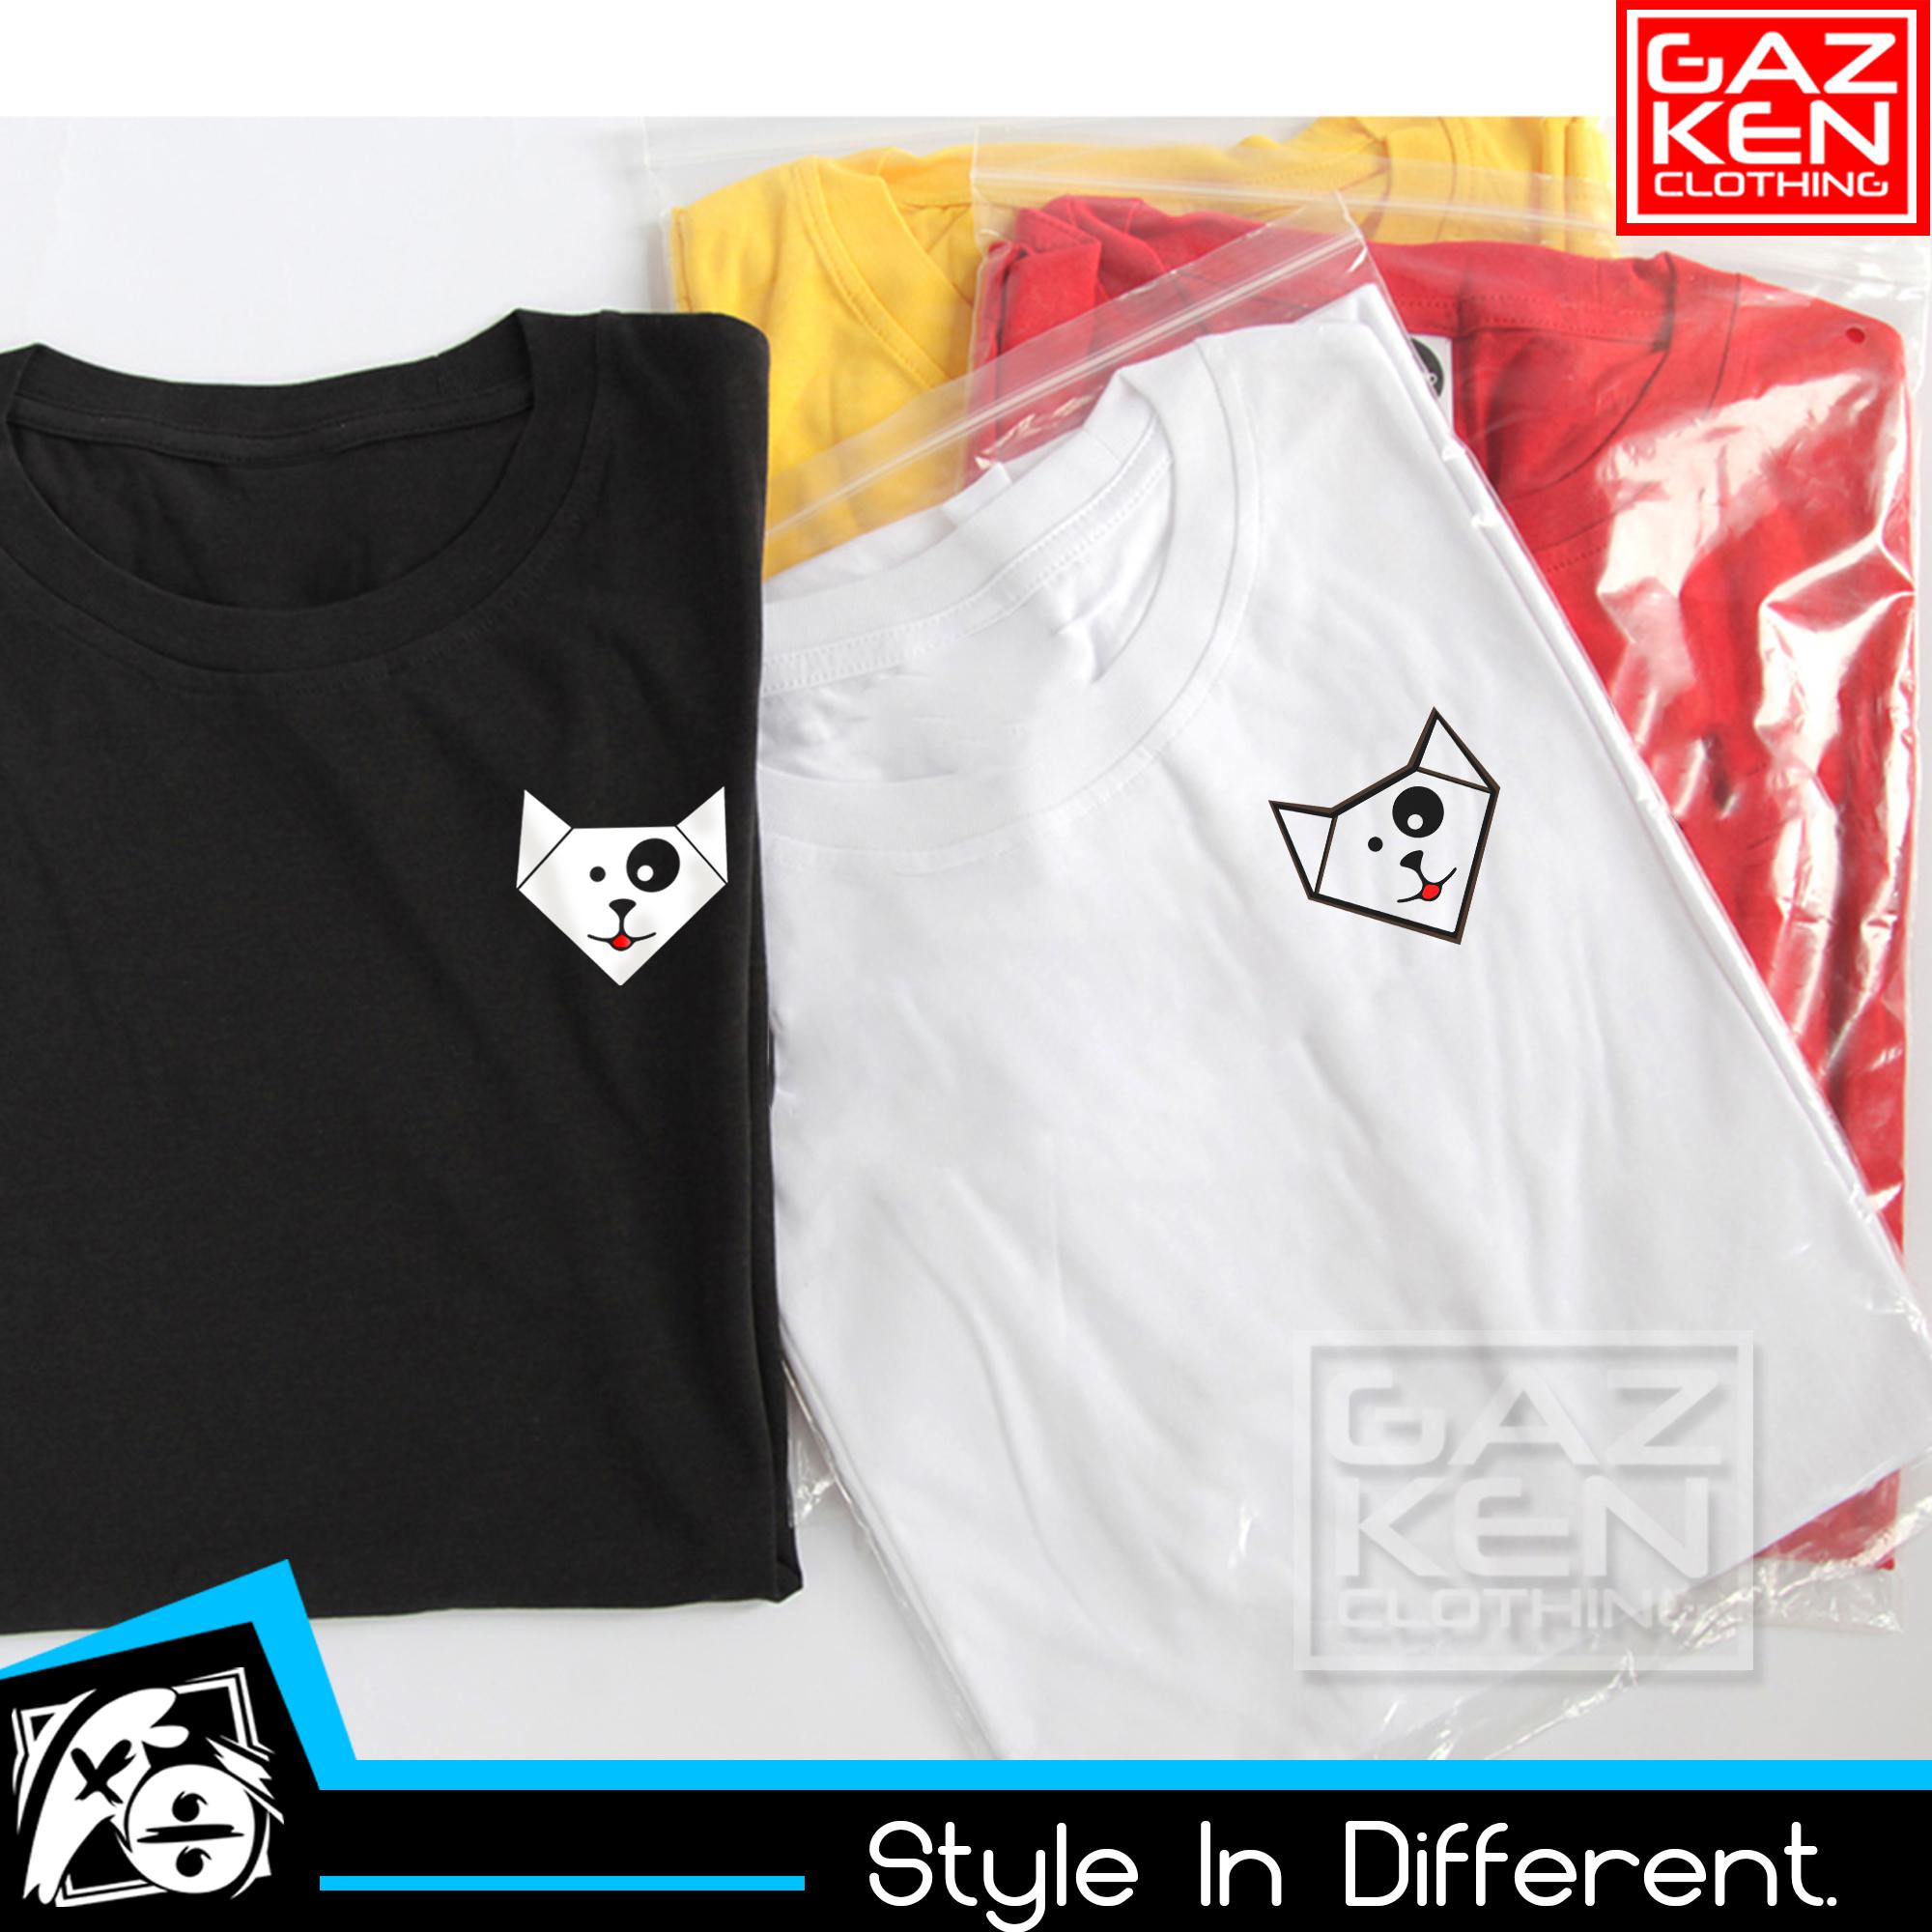 Kaos Baju Logo MiawAug Kecil Warna Putih Youtuber Gaming Gamer Miaw Aug Cotton Combed 30s Simple Keren Kualitas Distro